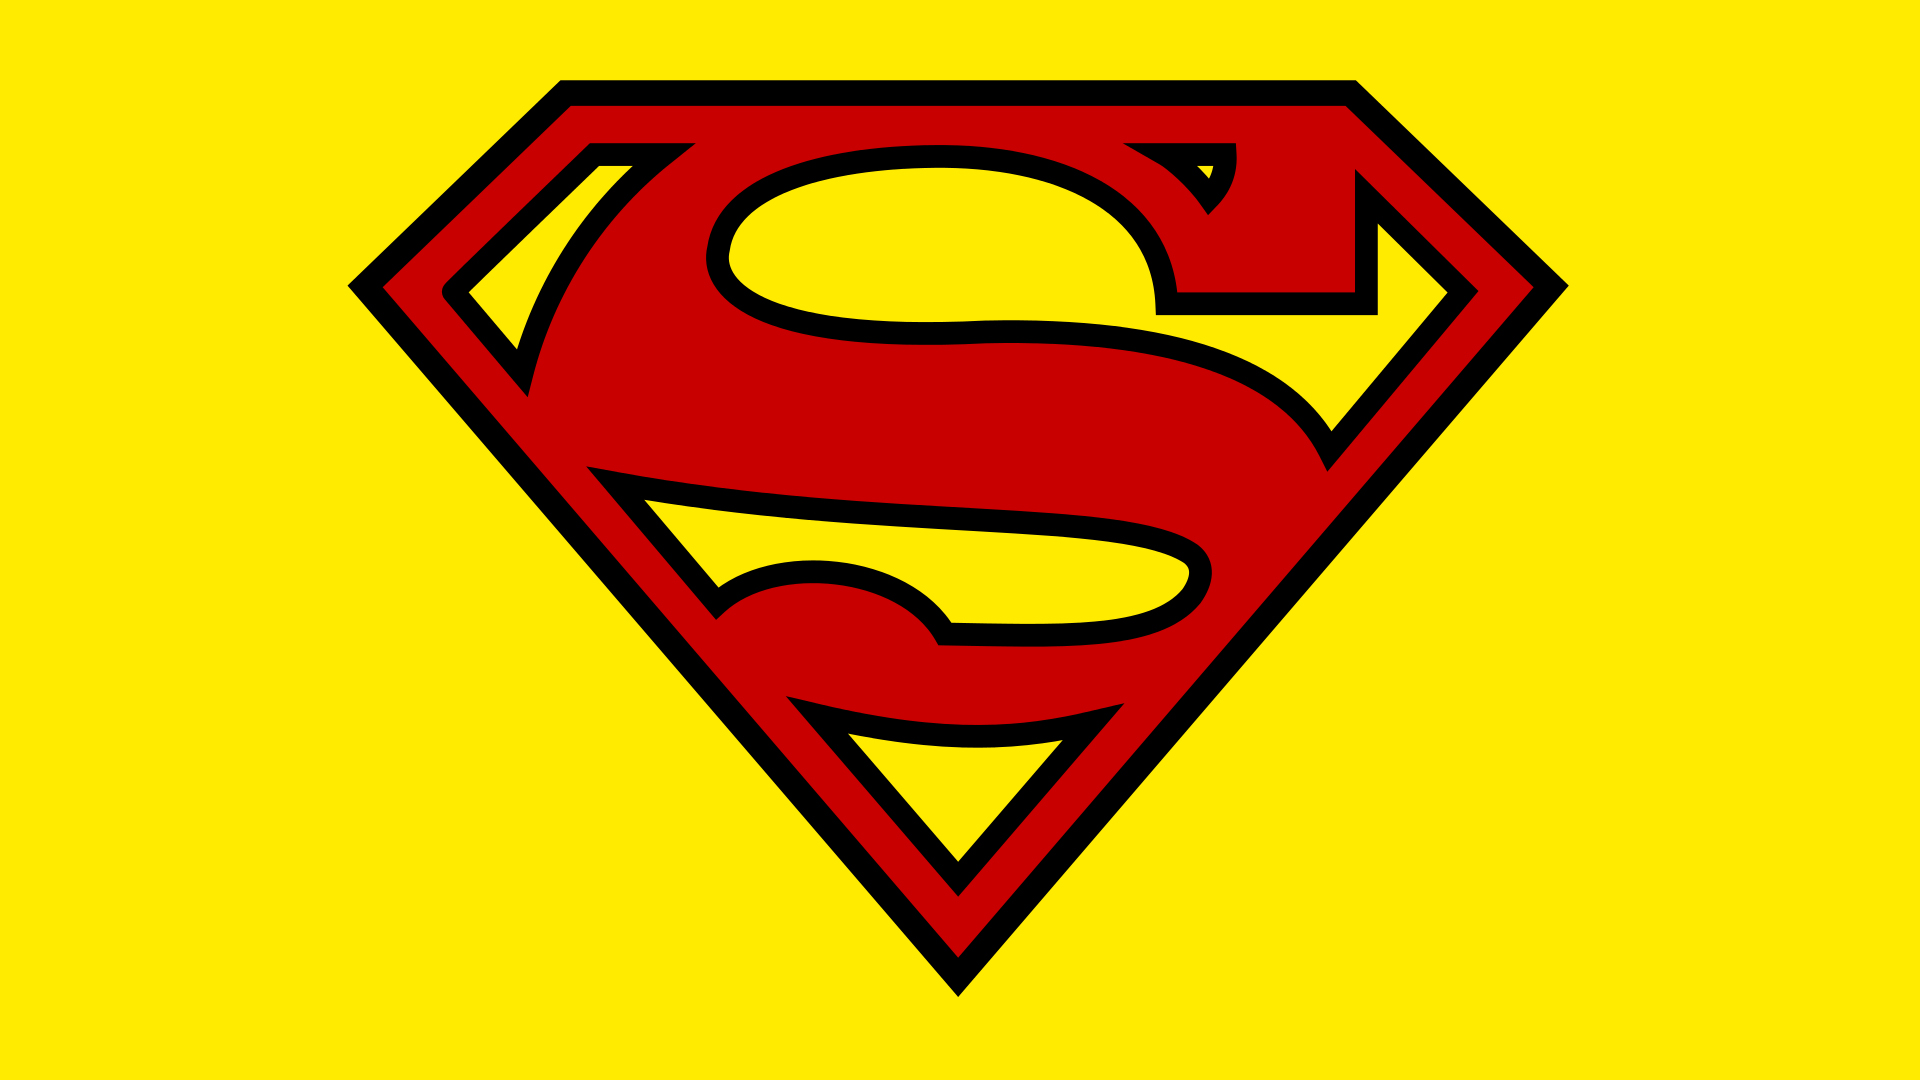 Superman logo.